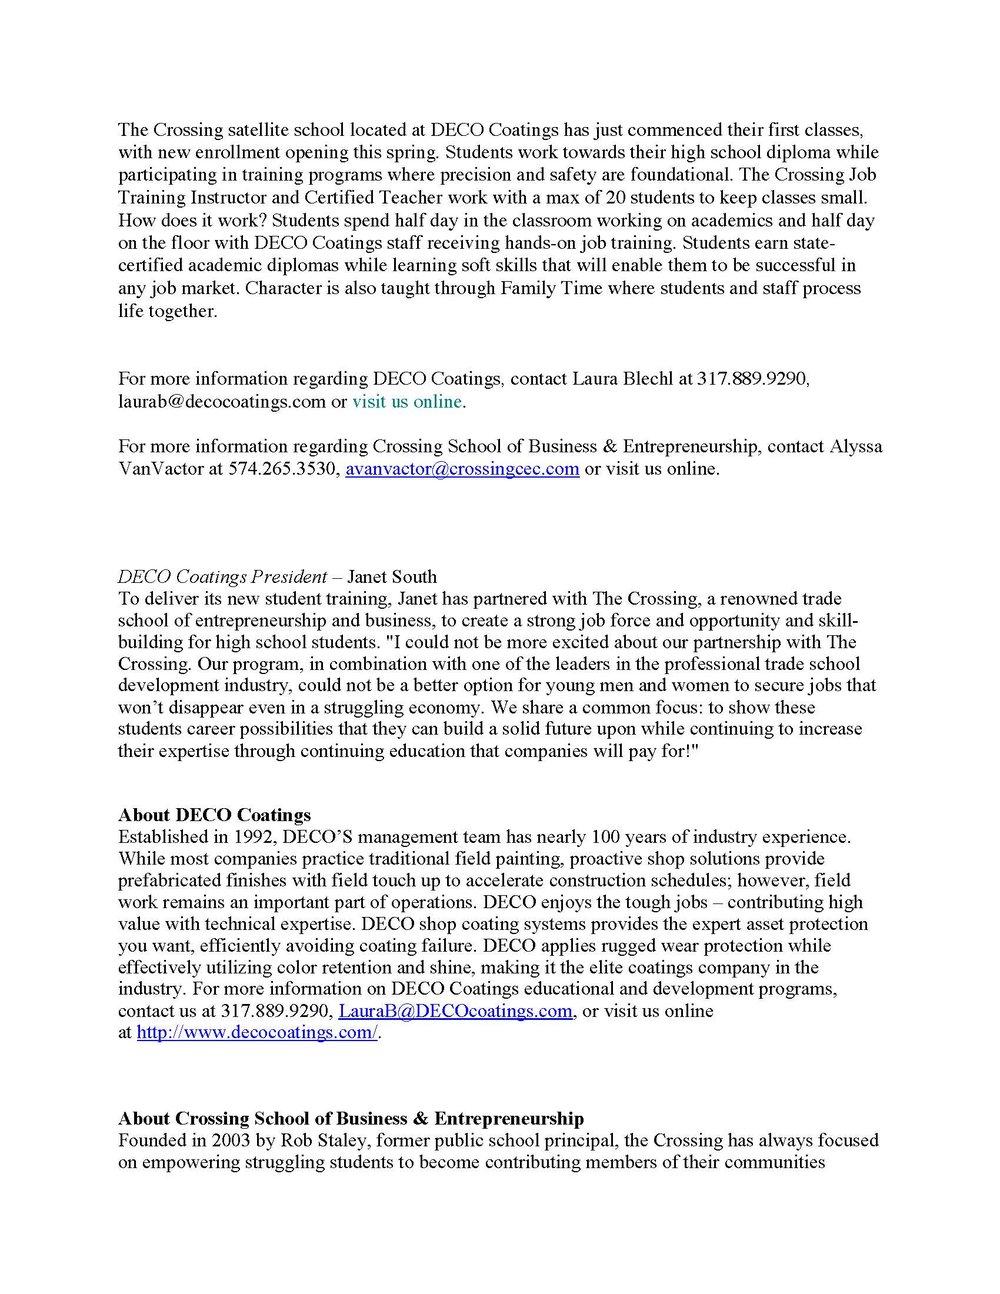 Satellite School Launch_Page_2.jpg